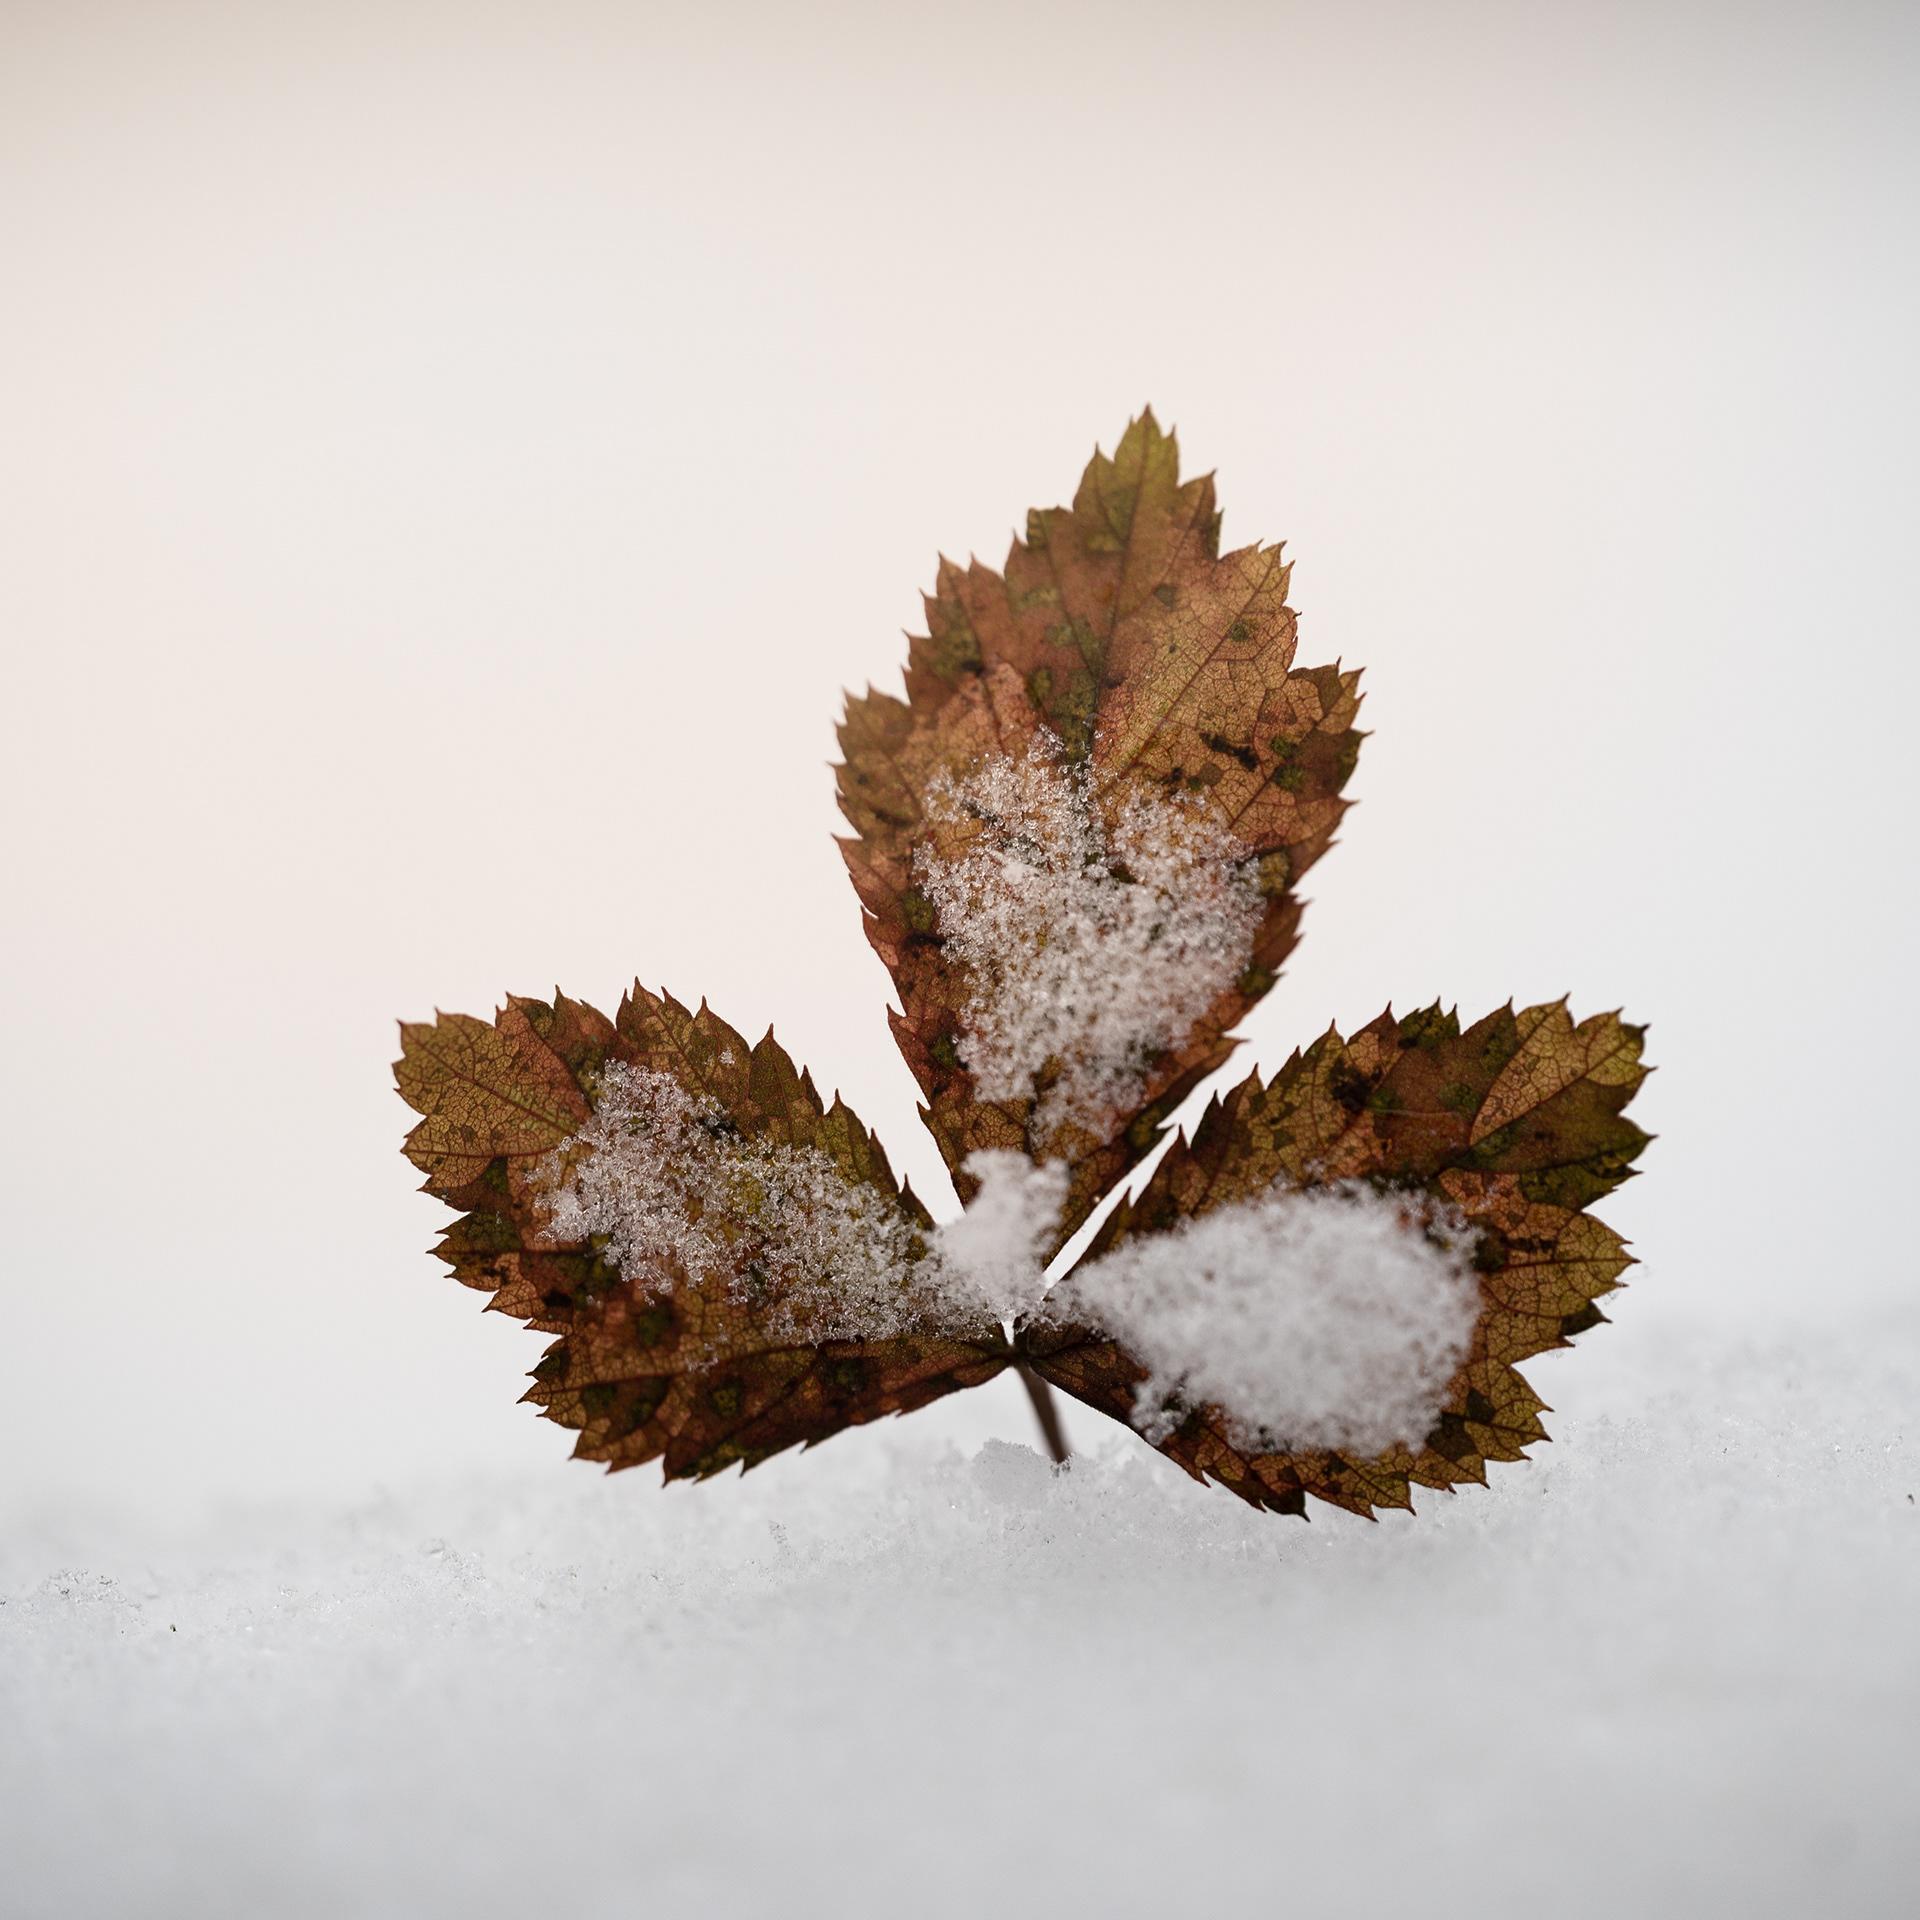 Winter Plants / фотограф Jonas Groß